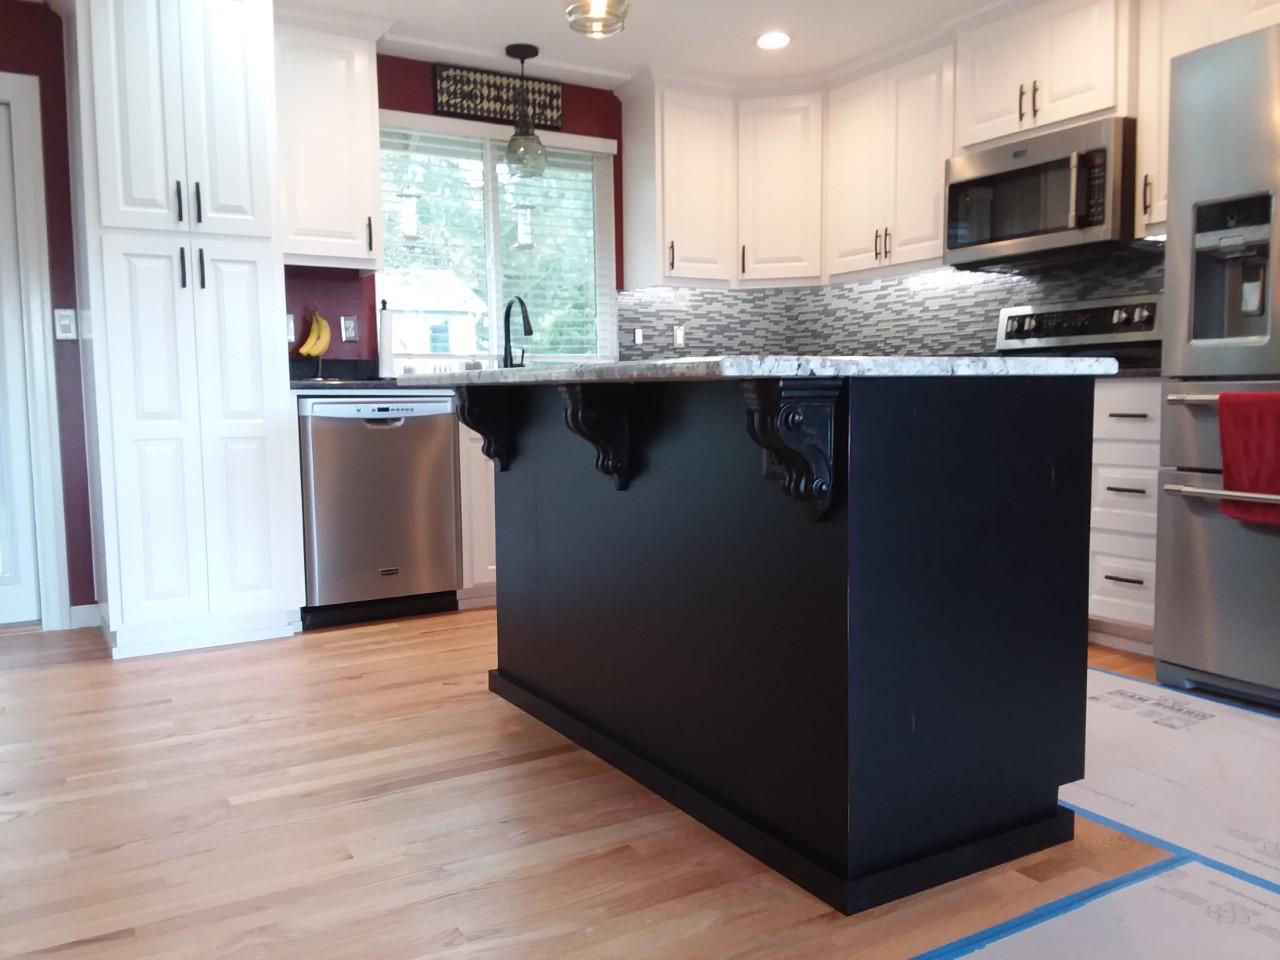 Creative Custom Cabinets White Kitchen Cabinets With Dark Island